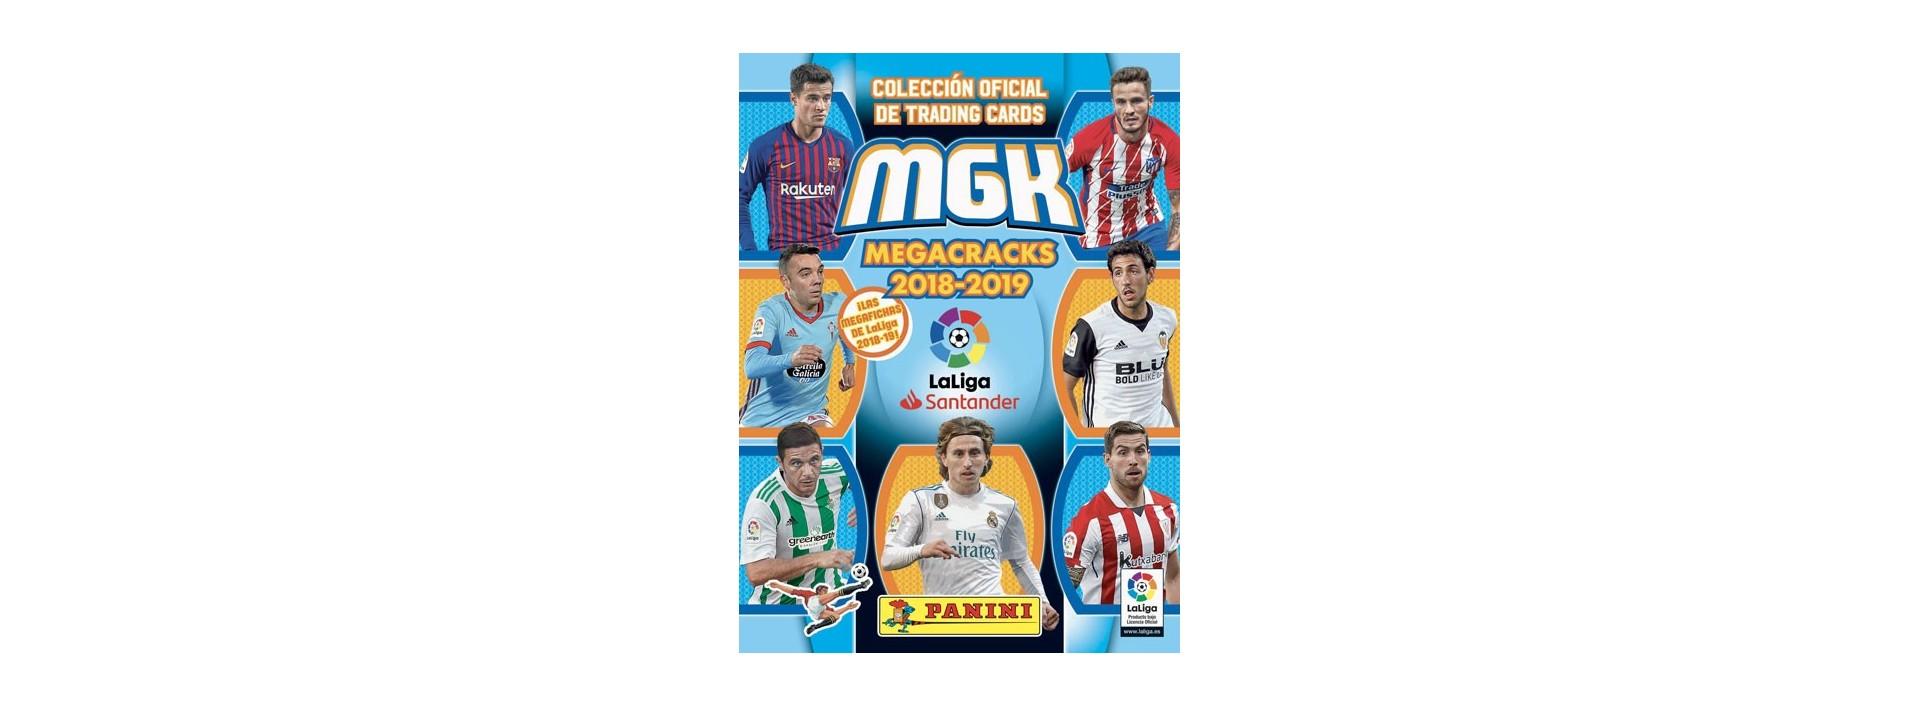 MEGACRACKS 2018/2019